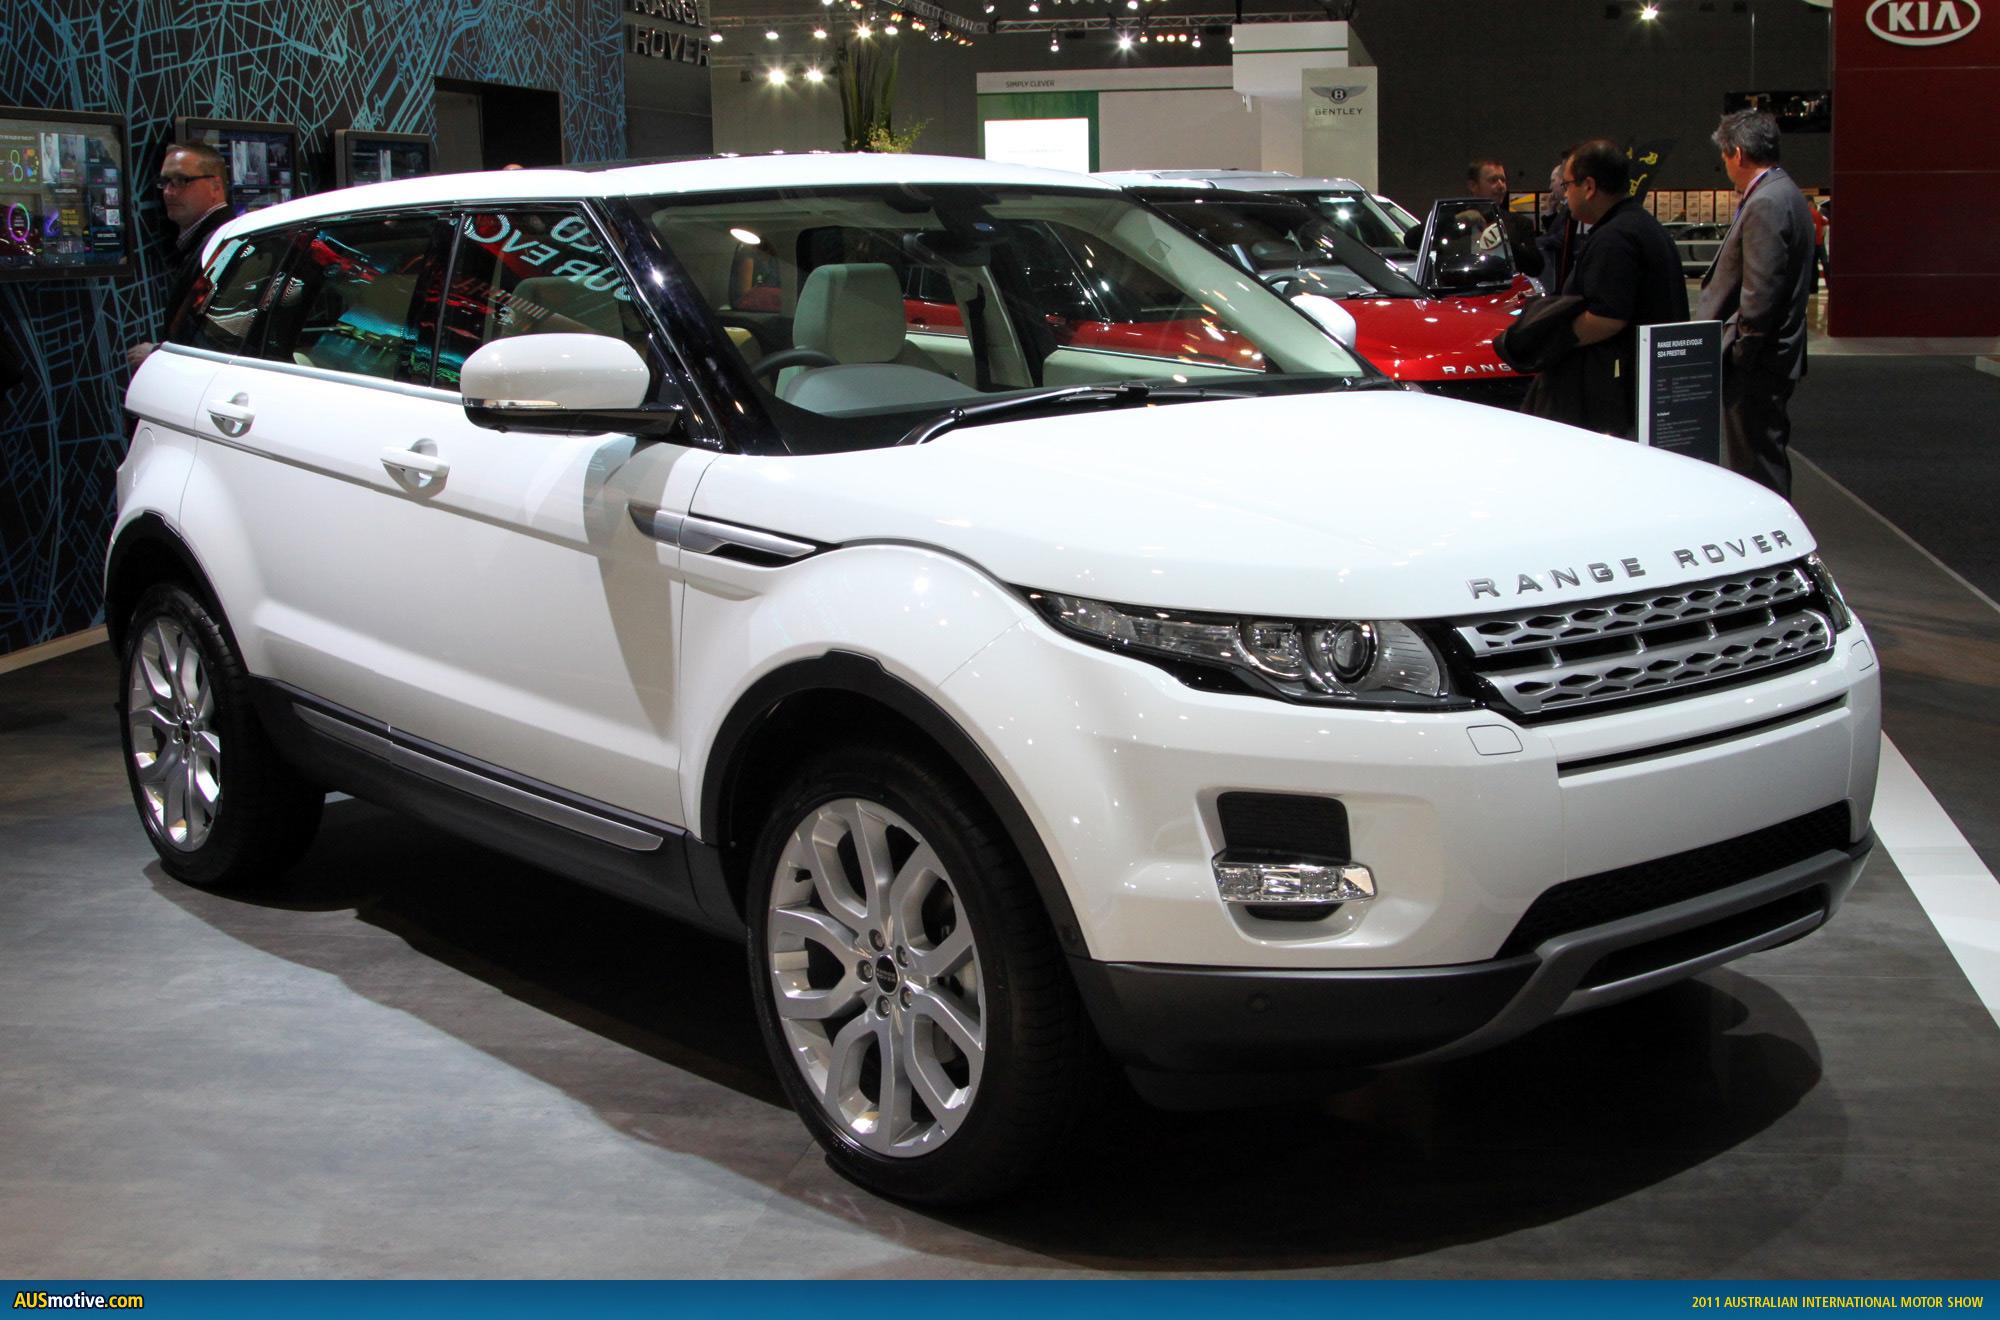 Ausmotive Com 187 Aims 2011 Gallery Range Rover